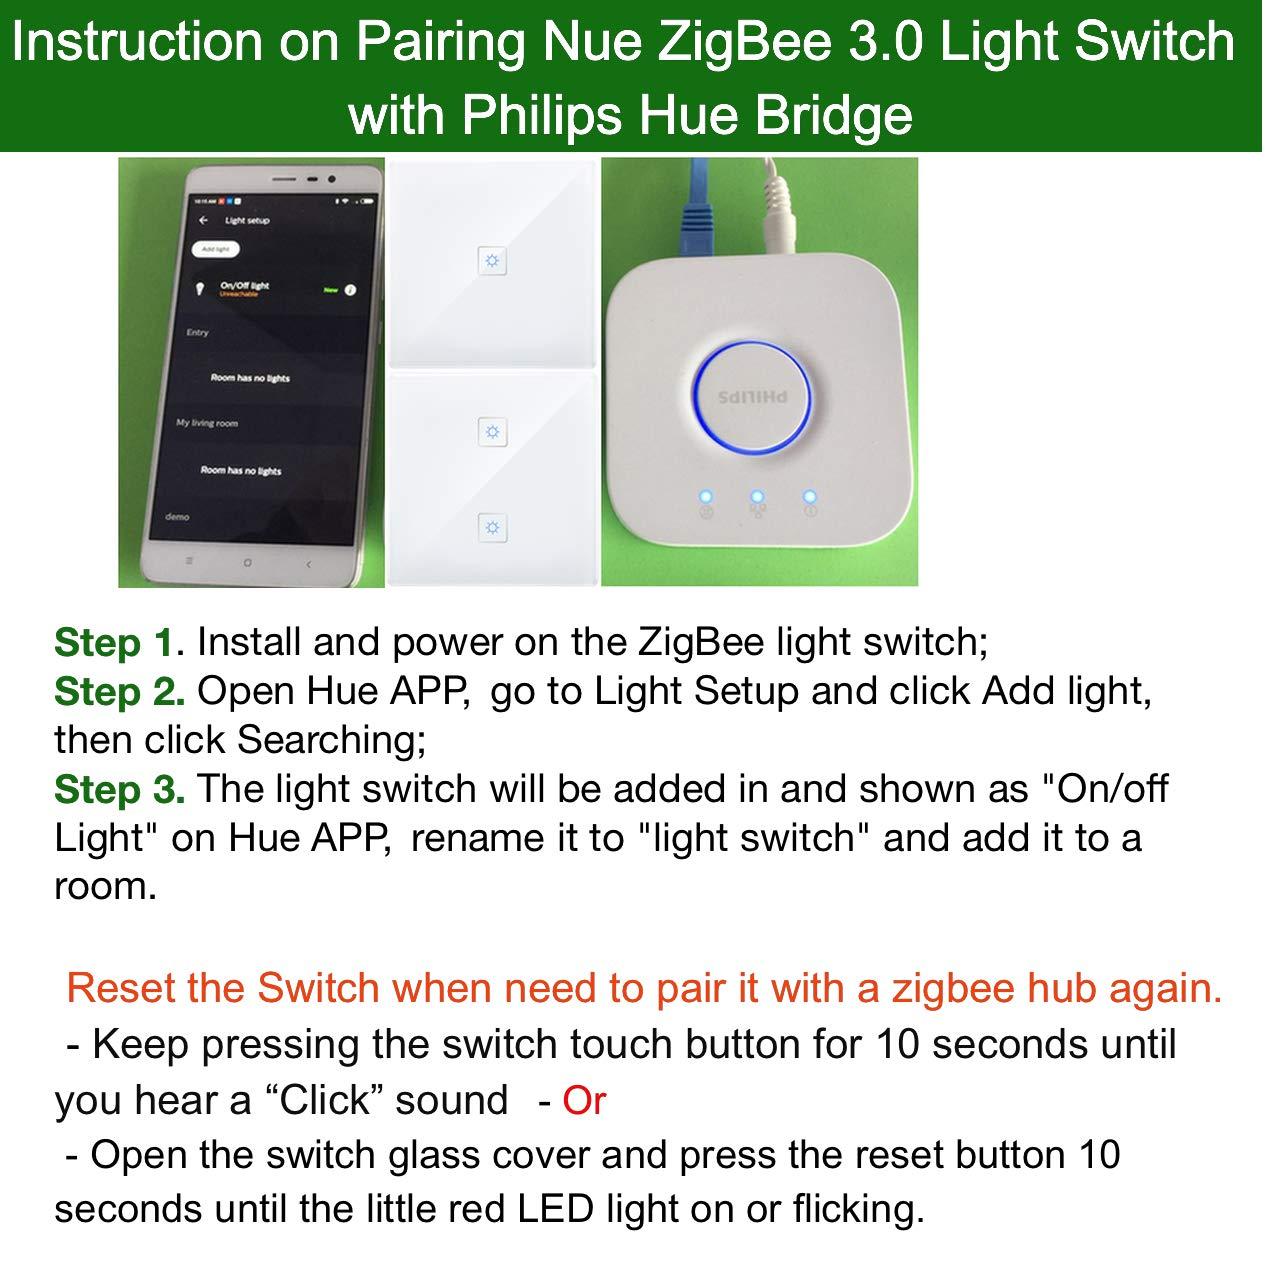 230V Smart ZigBee 2 Gang Light Switch for Echo Plus, SmartThings Hub,  Lightify ZigBee Hub to Control Normal Lights, LED Downlights Smart Home